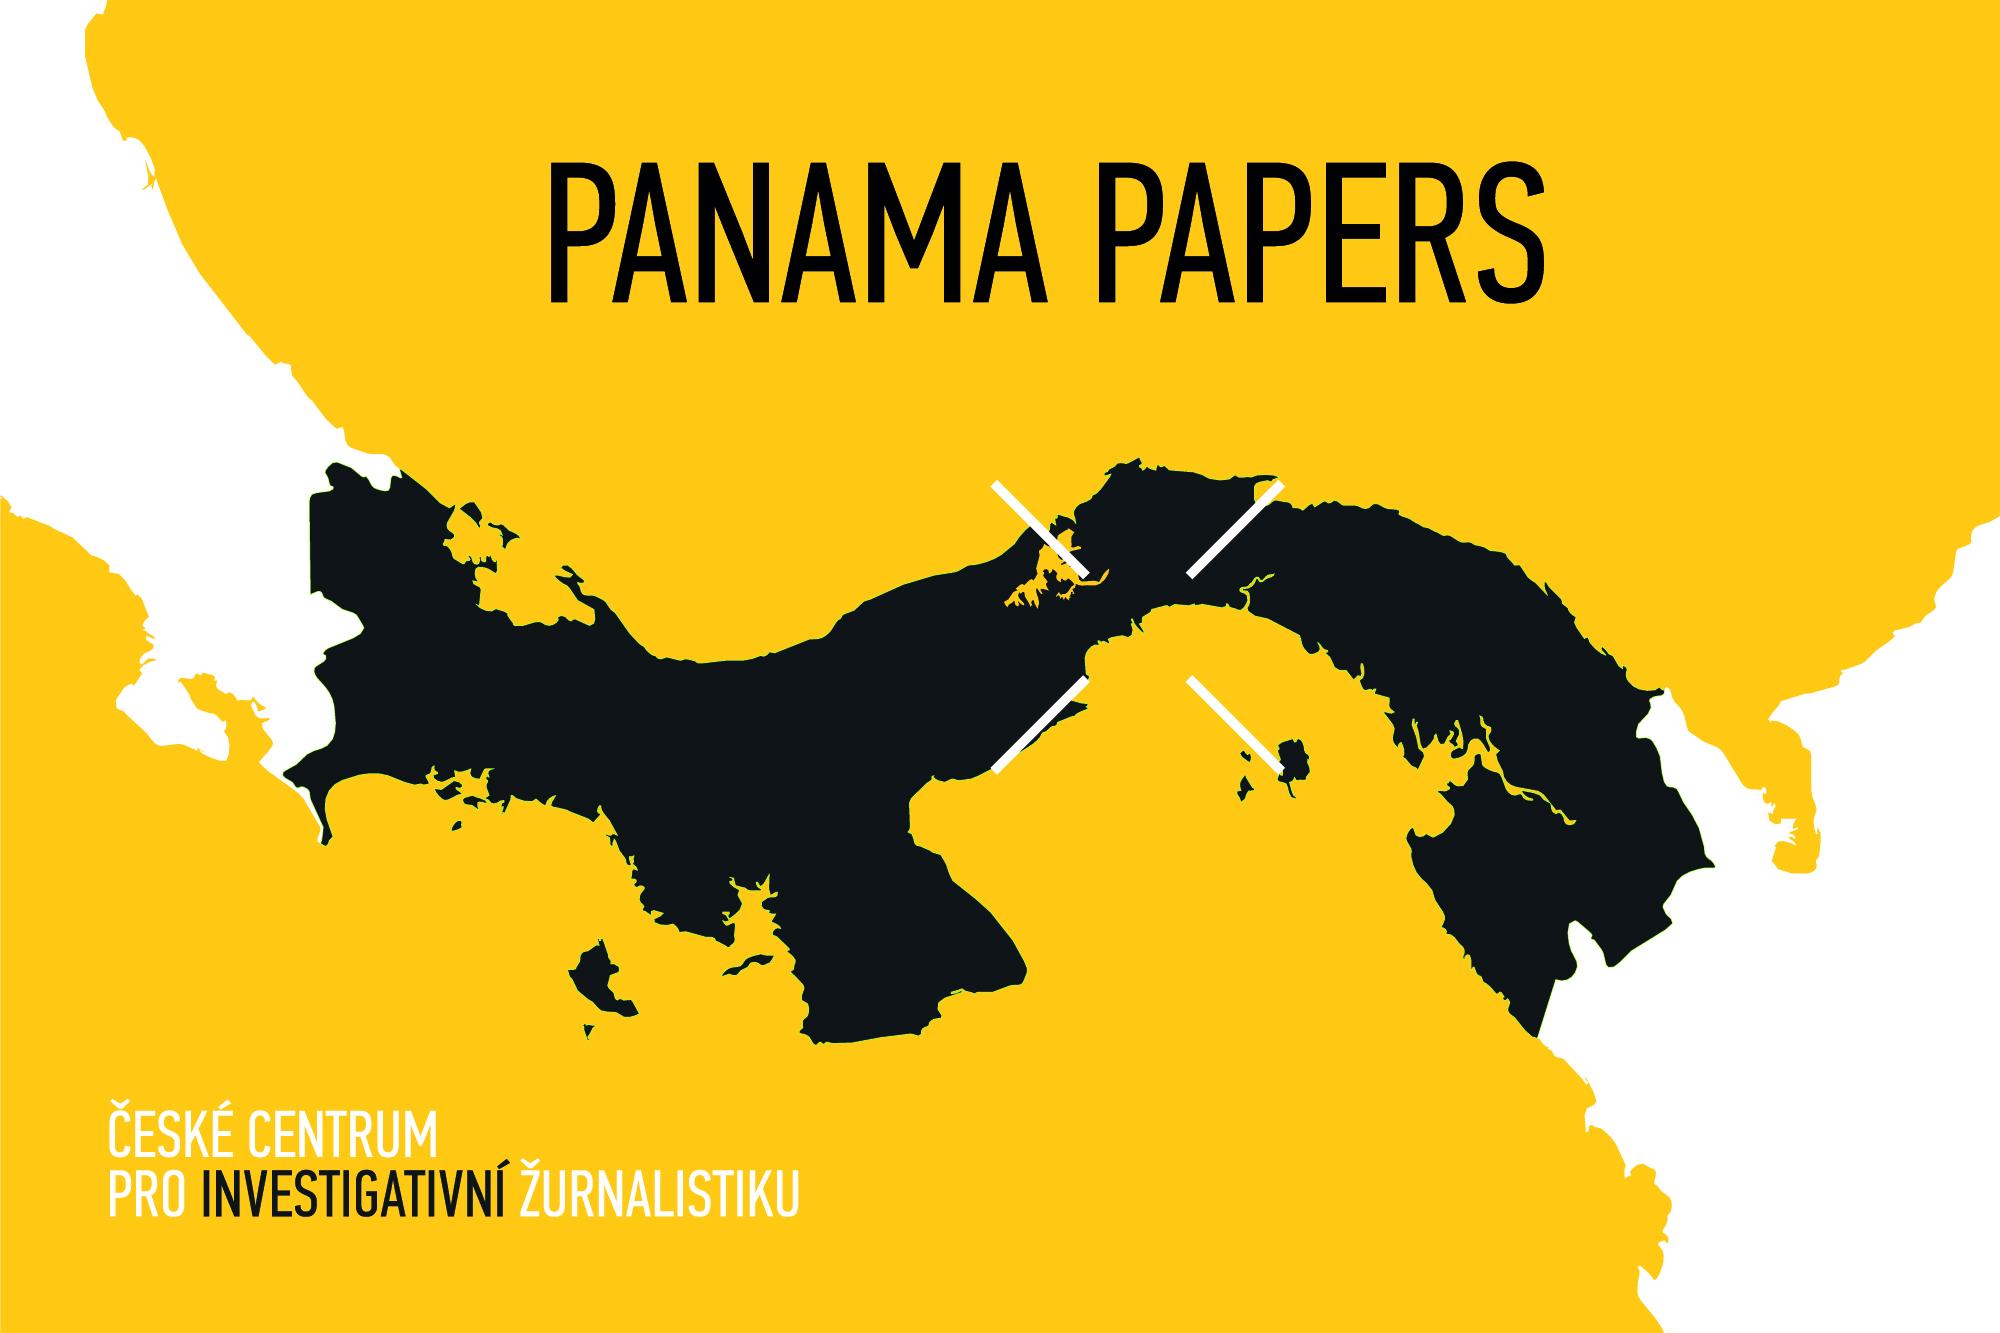 #PanamaPapers Slovensko